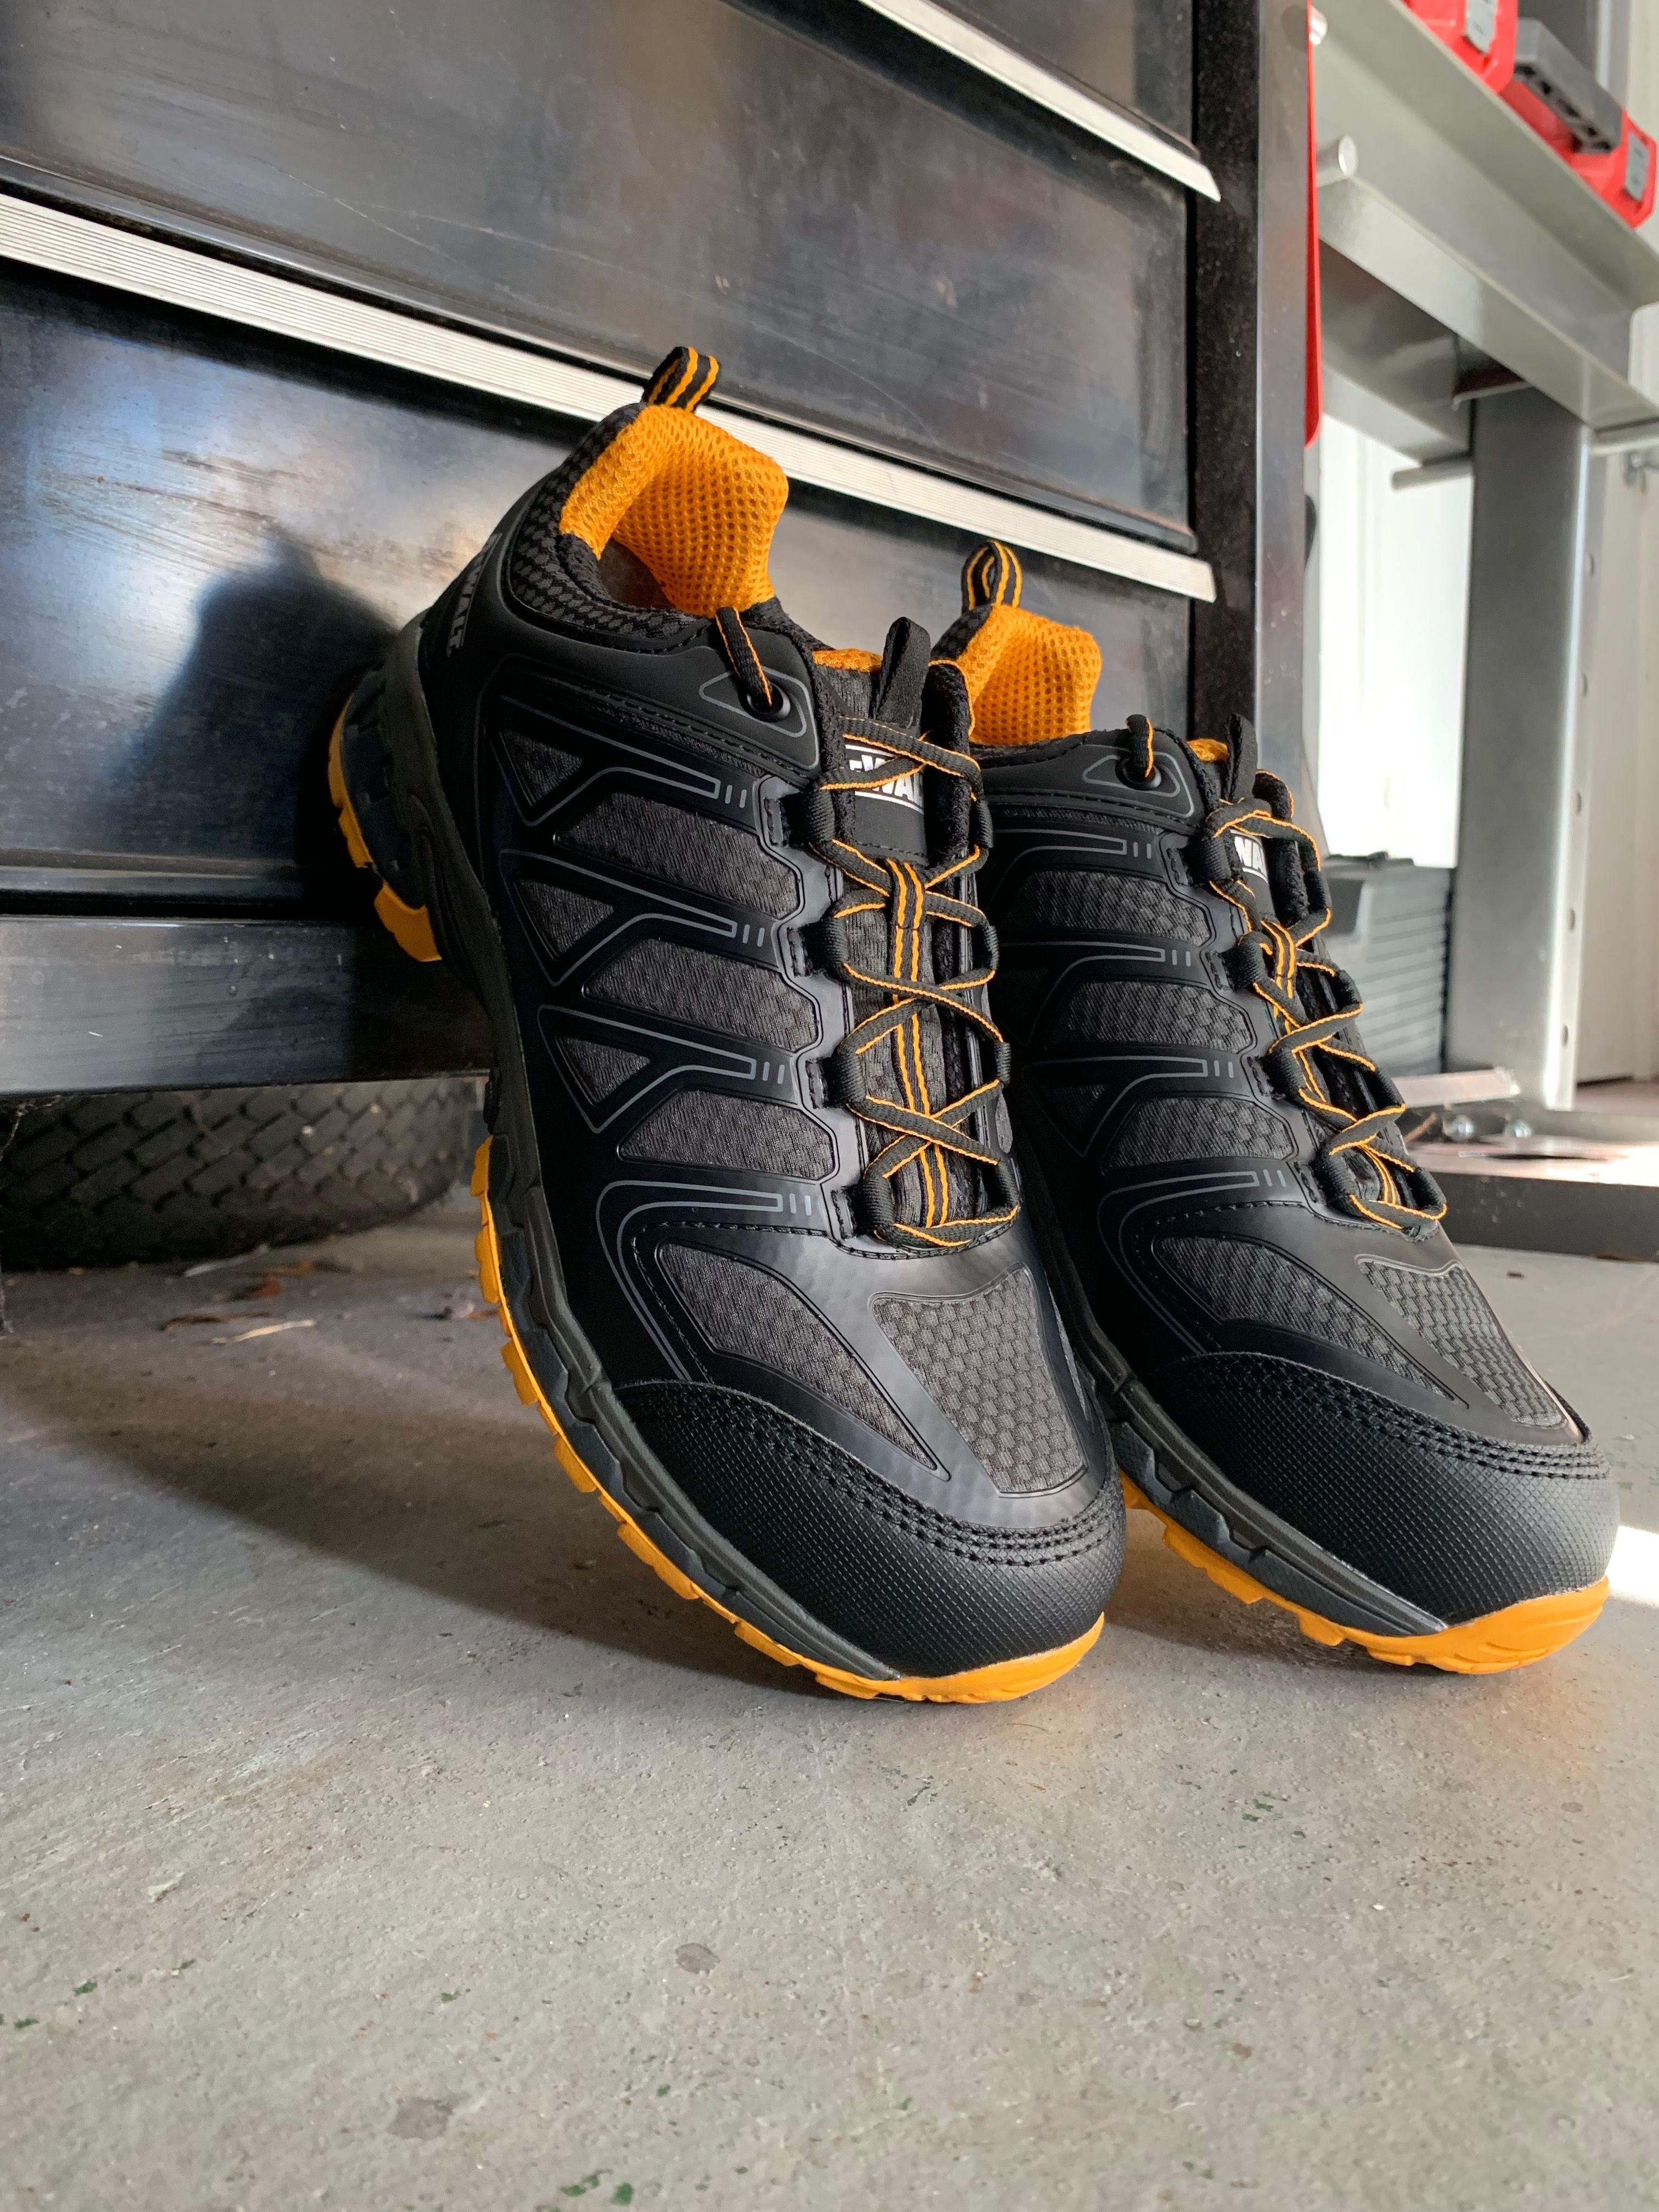 463b4ee51b9 Boron - Aluminum Toe - Men's / Black in 2019 | Work Boots | Boots ...